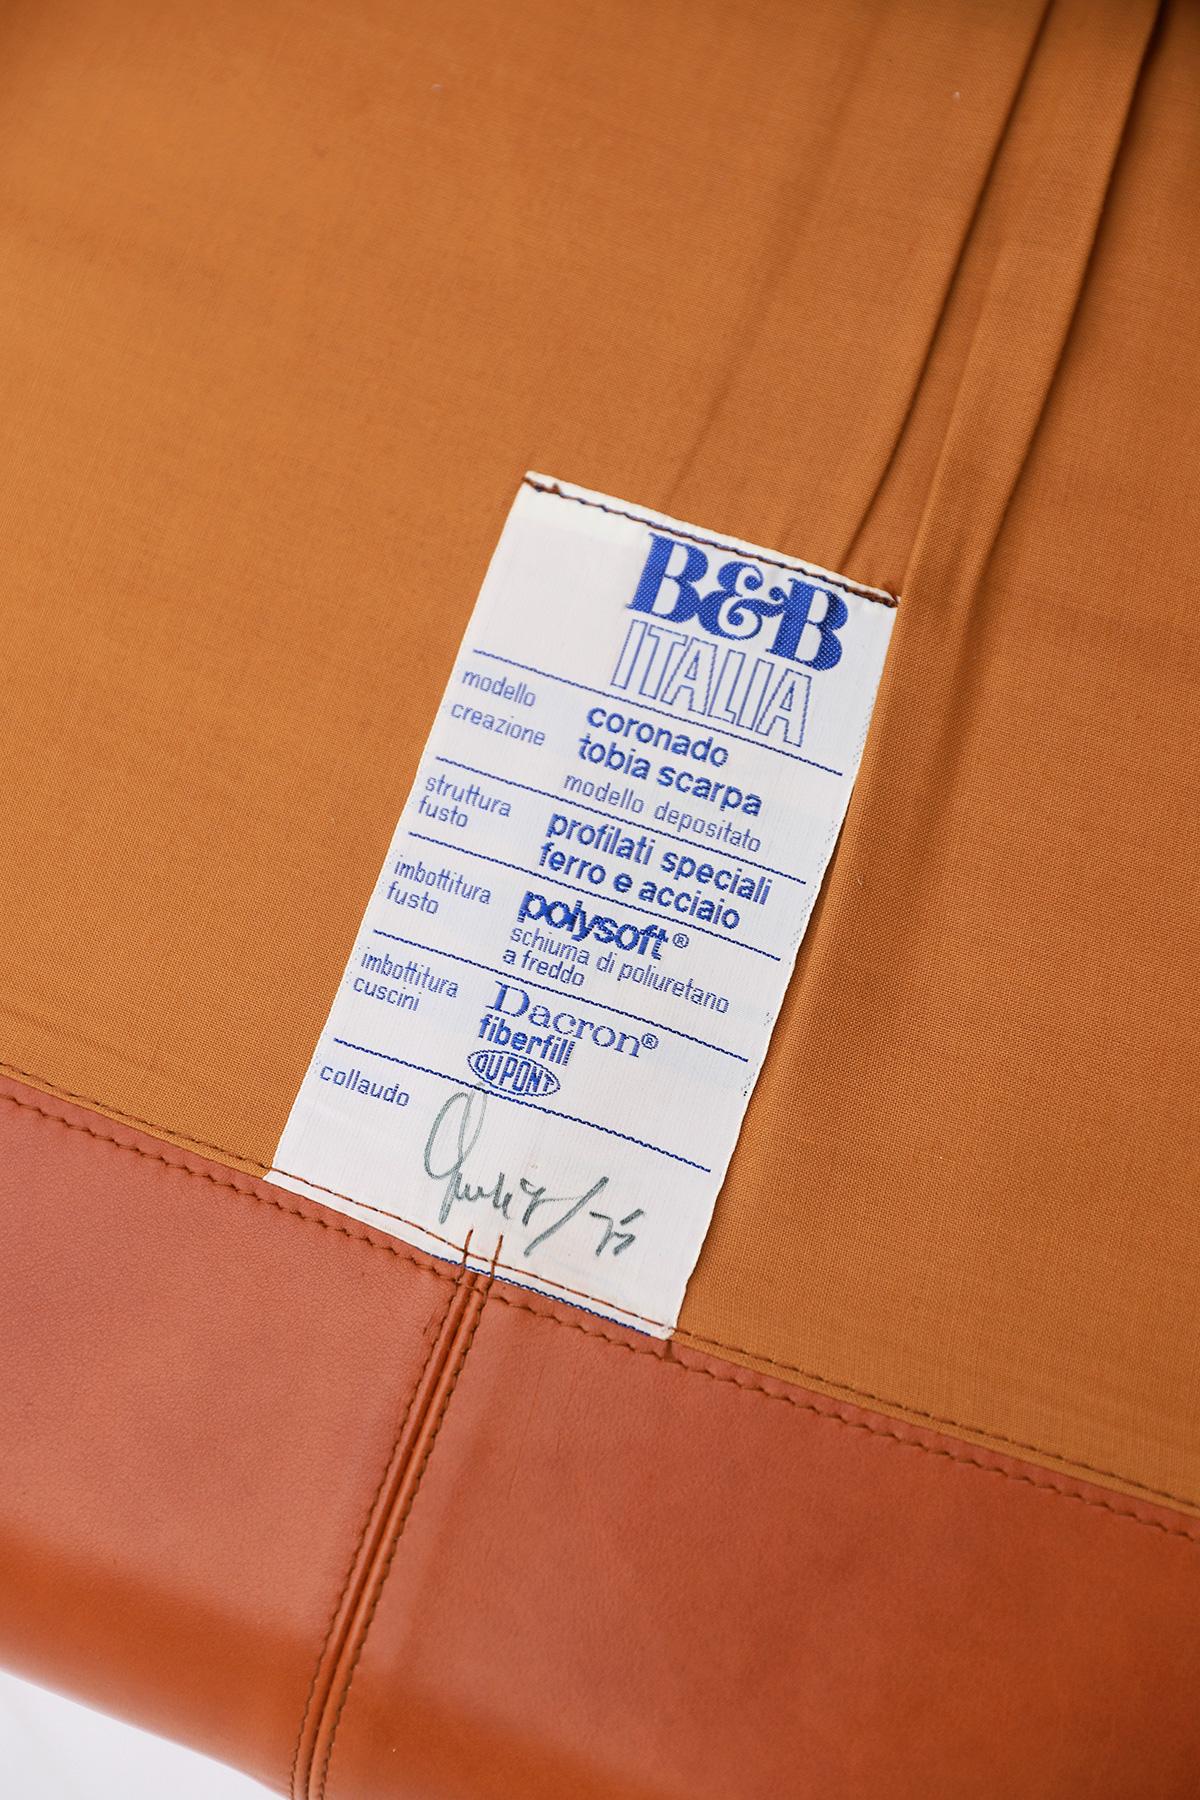 Tobia Scarpa 4 seat Cognac Leather Sofa B&B Italiaimage 8